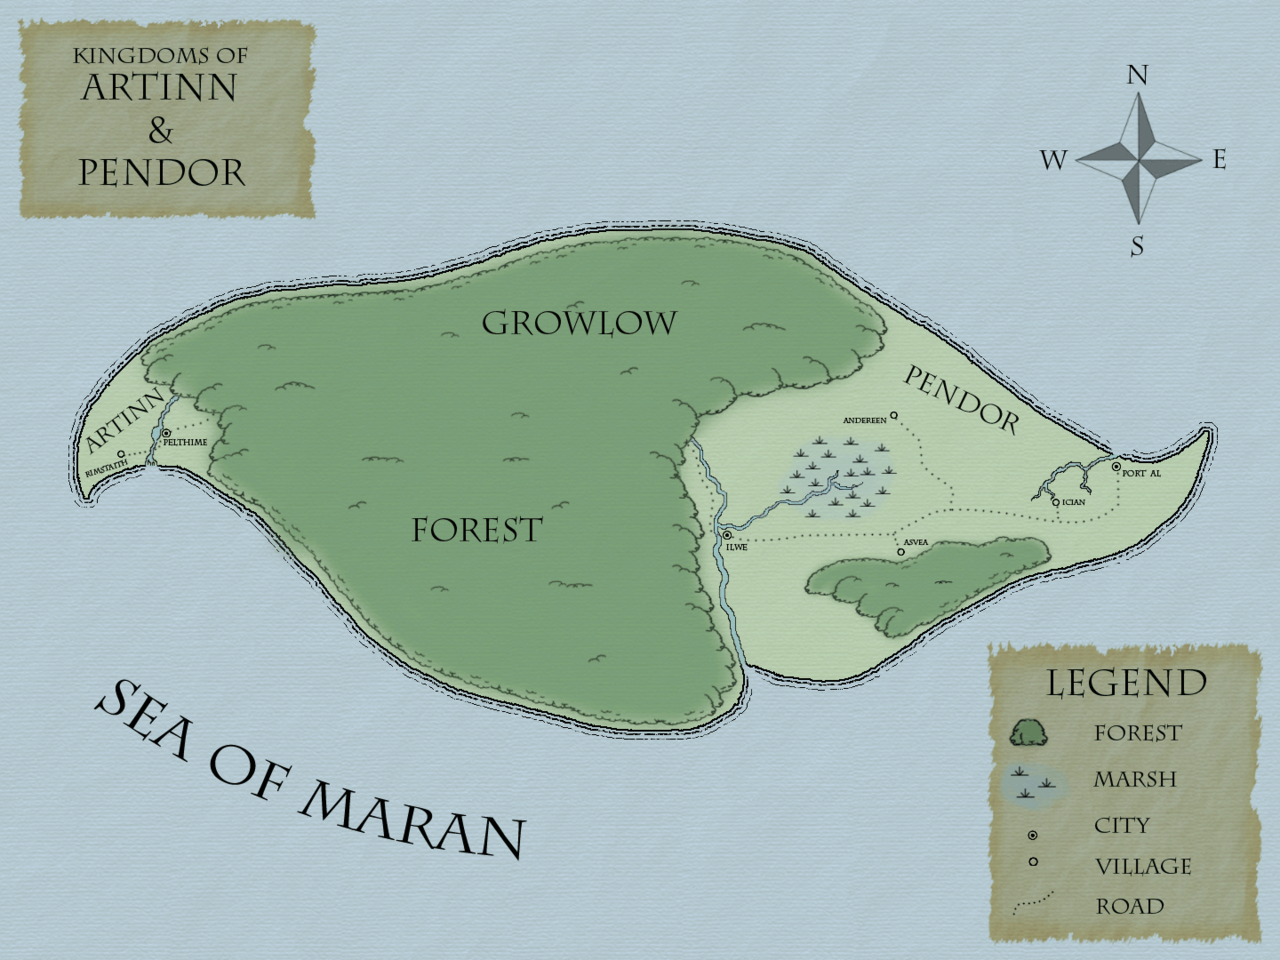 Beginner island kaart 4